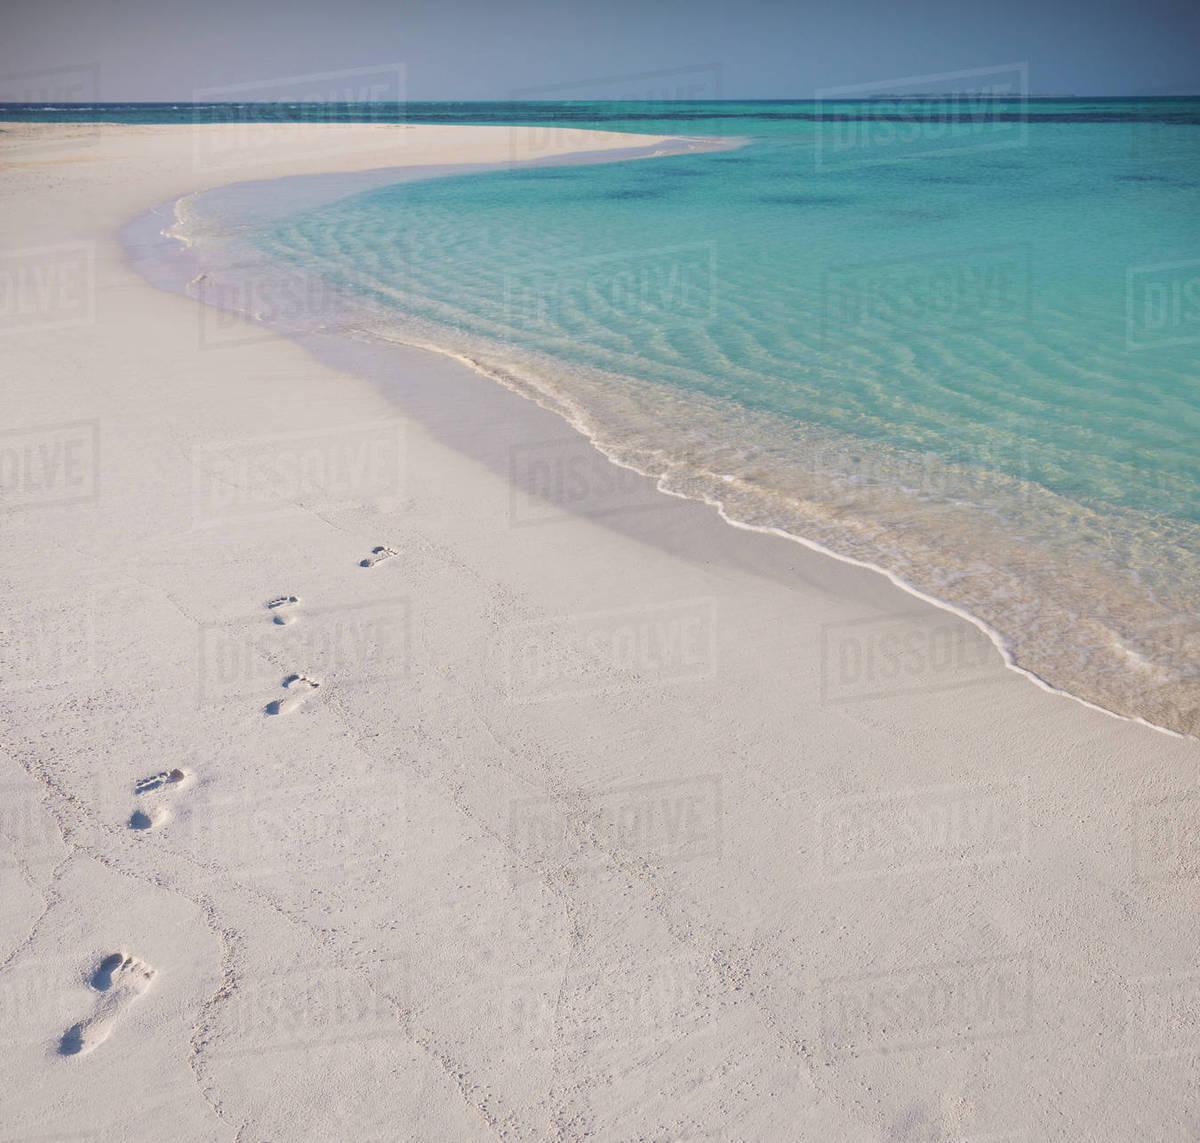 992b326b0a6d4 Footprints in sand on tropical beach - Stock Photo - Dissolve